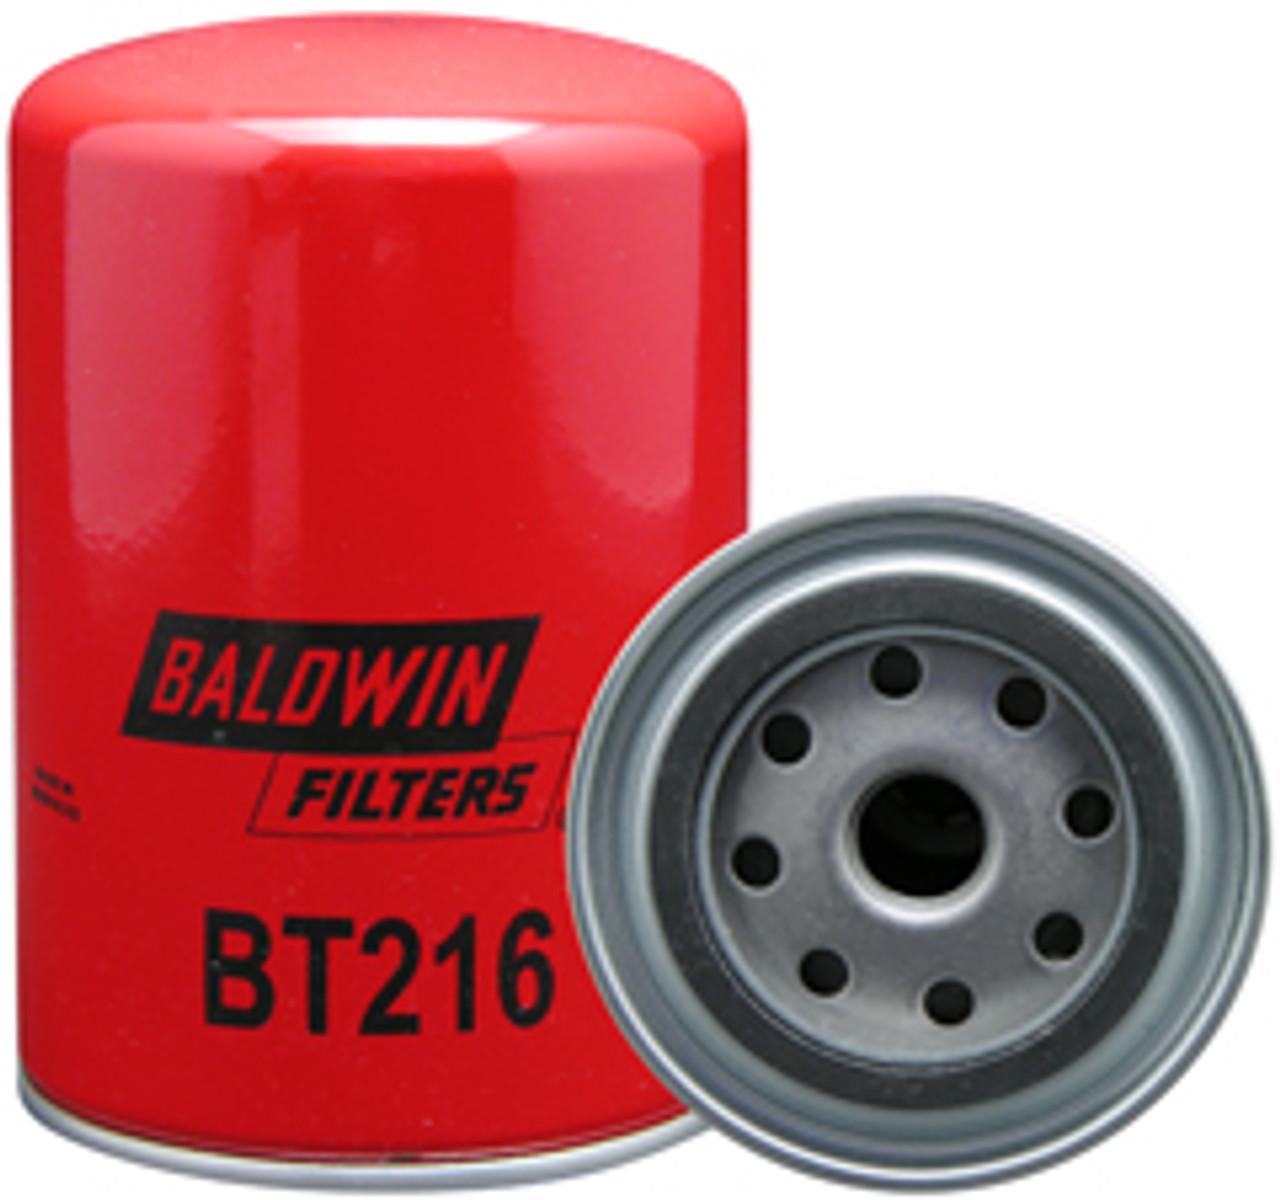 BALDWIN FILTERS BT486 Oil Filter,Spin-On,Full-Flow